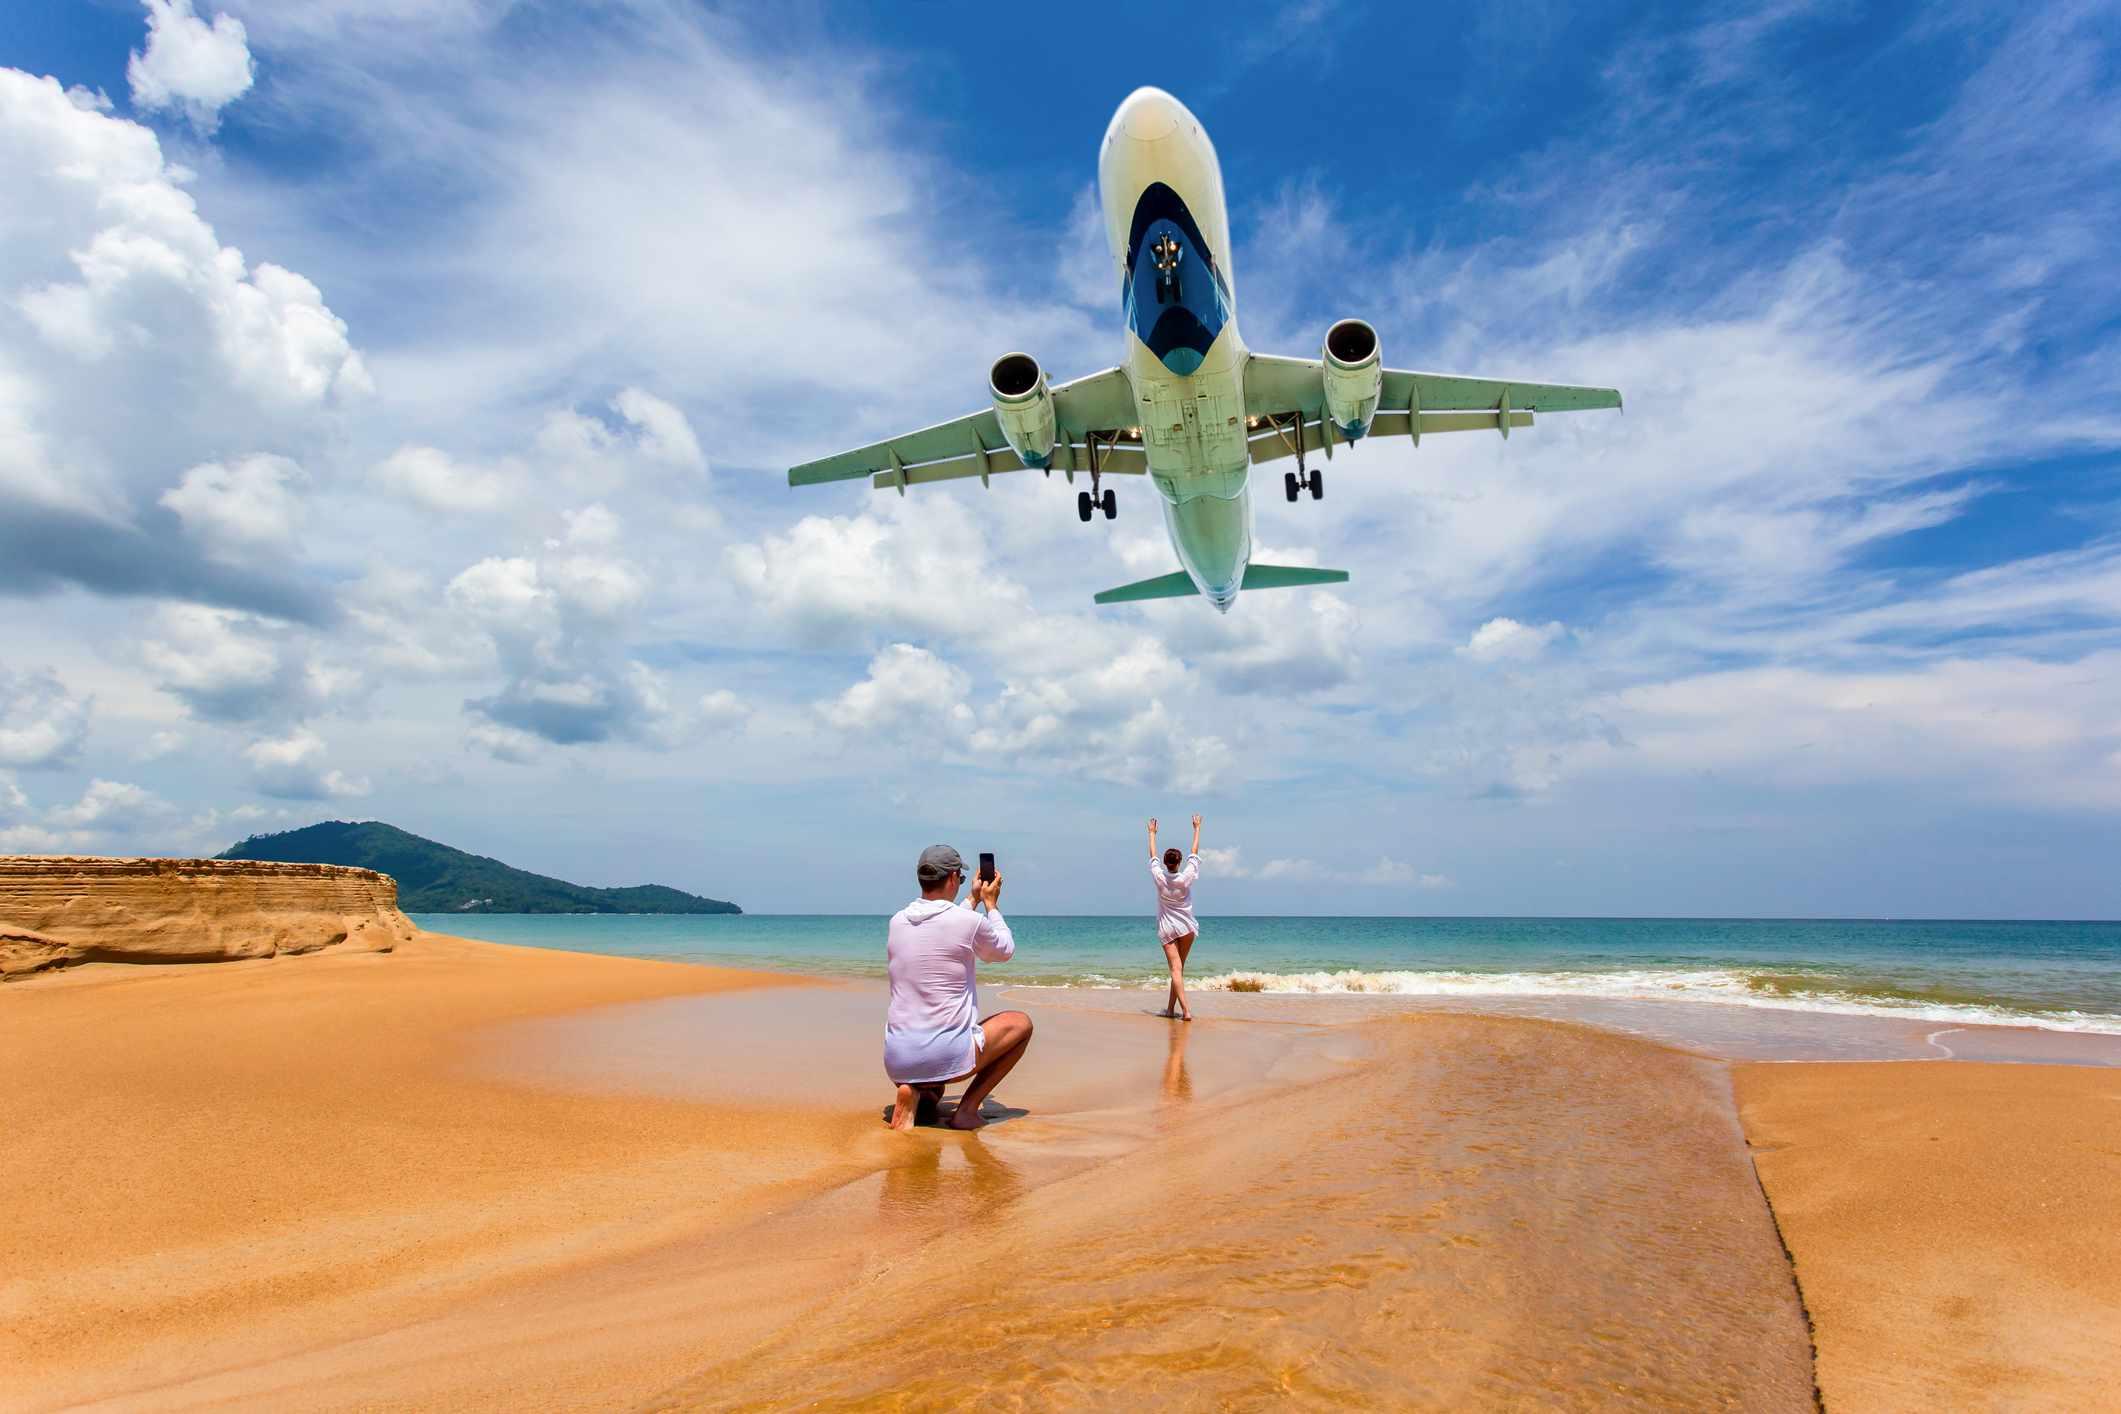 Plane spotting at Mai Khao Beach, Phuket, Thailand